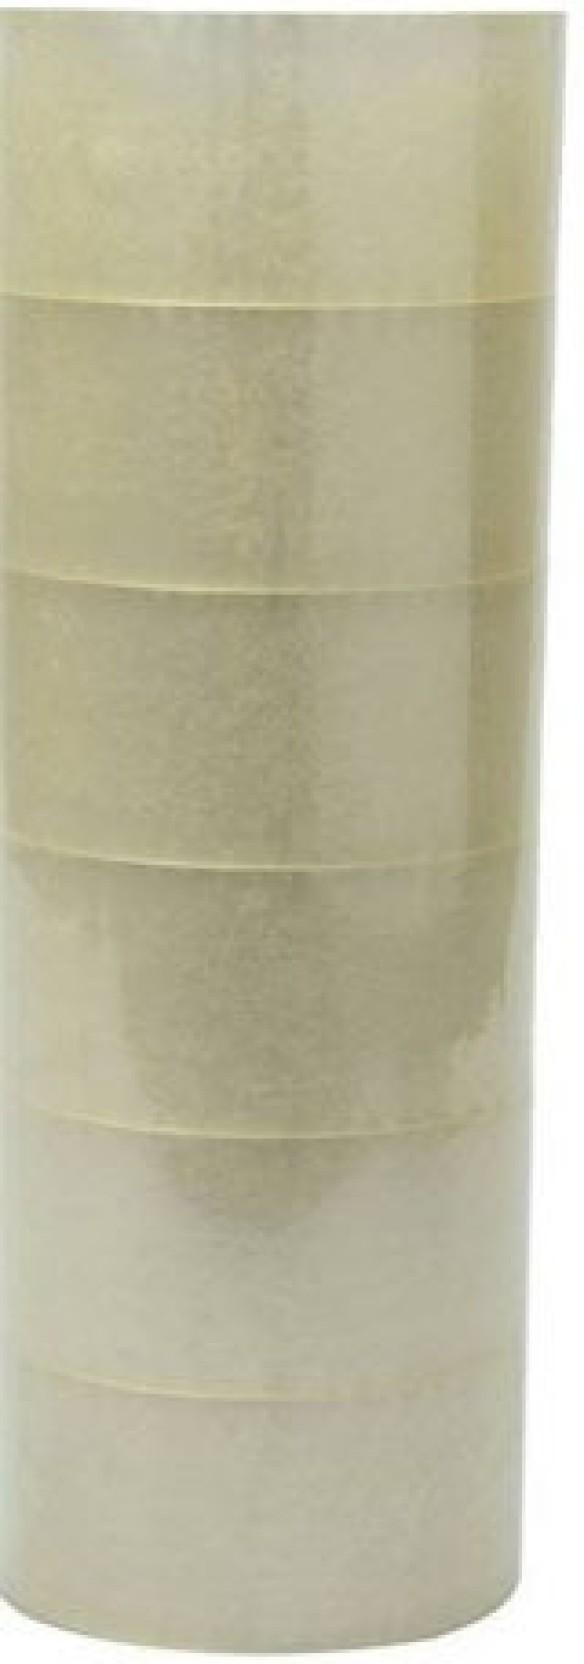 Bopp self adhesive tape manufacturers in bangalore dating